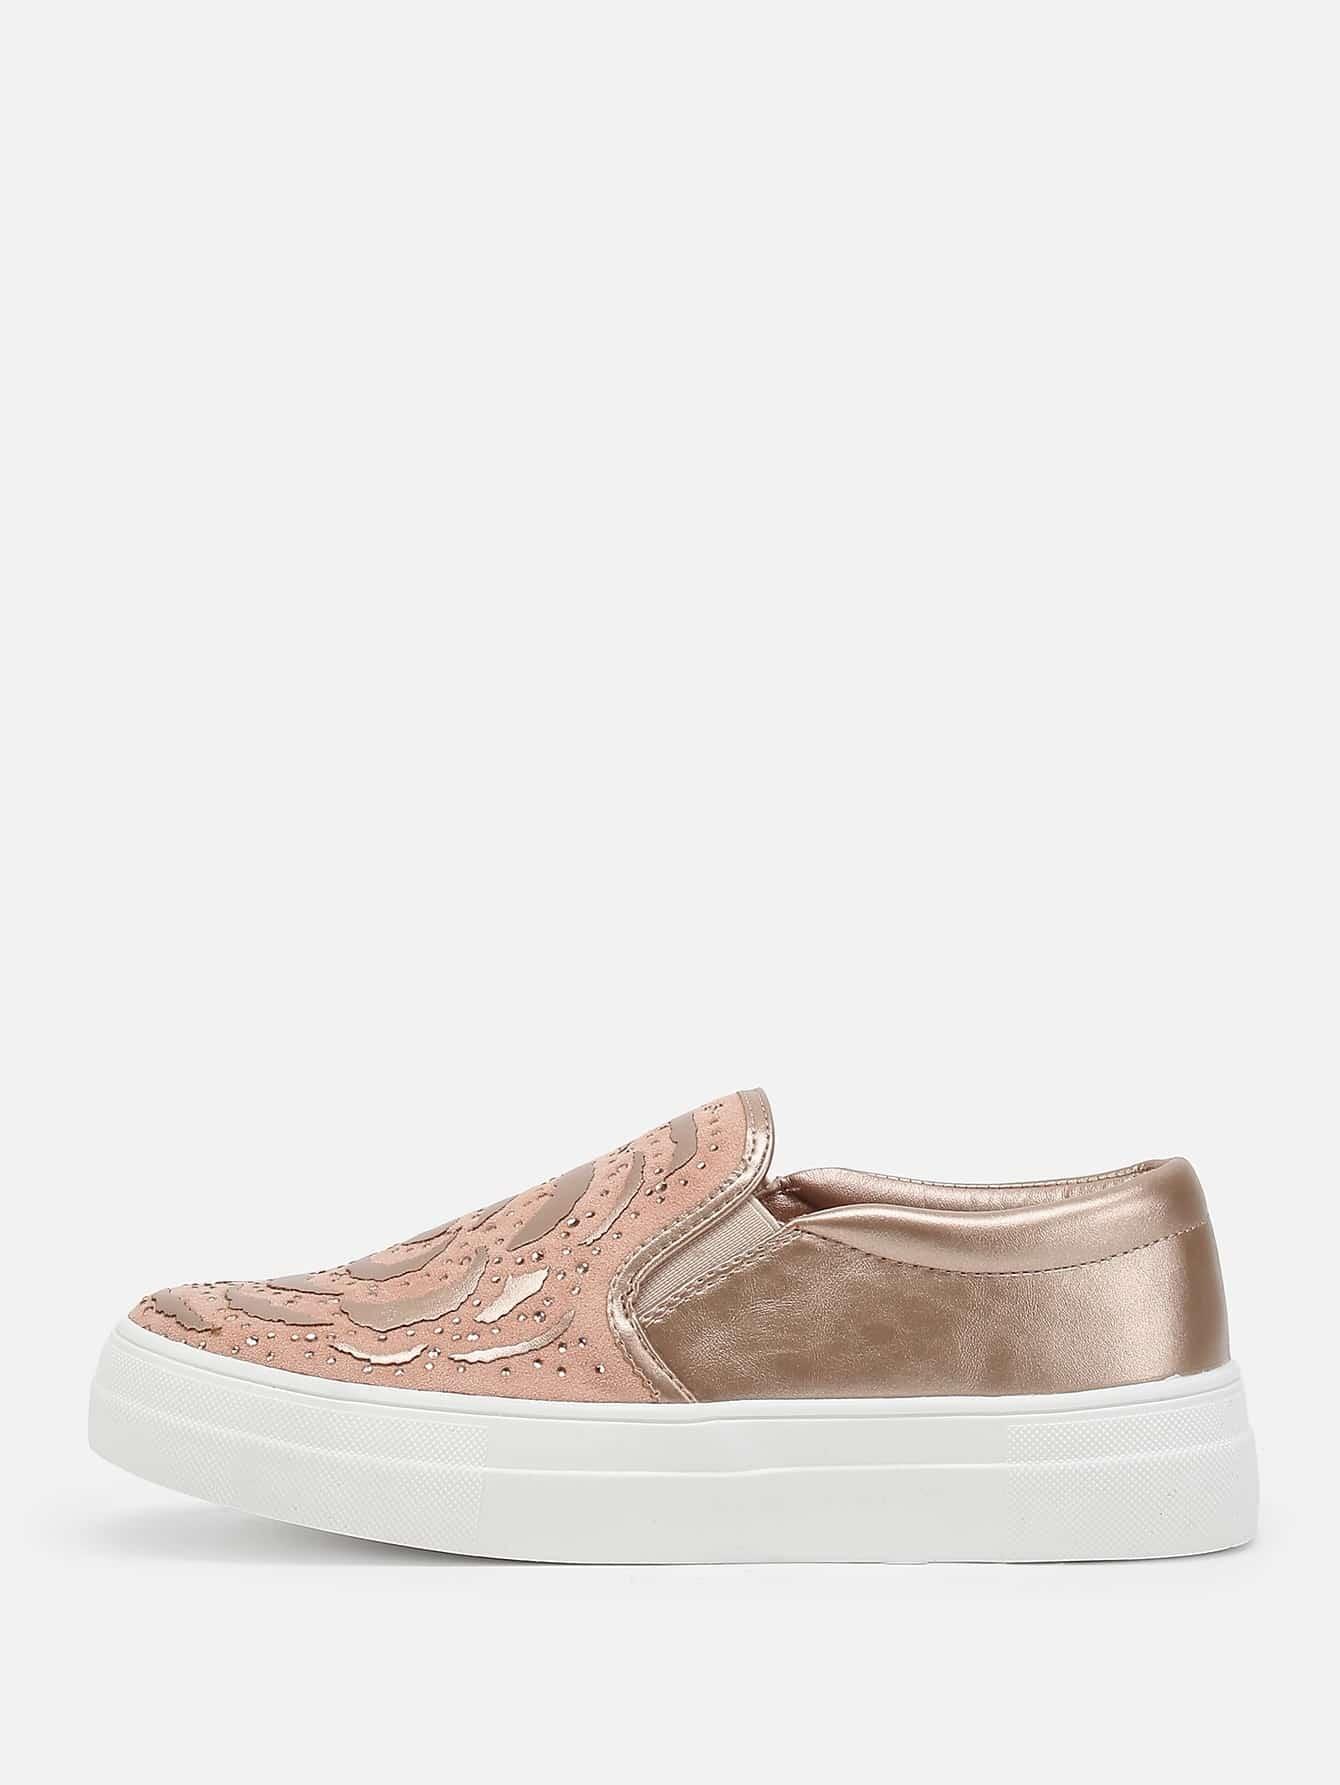 Rhinestone Detail Flatform PU Sneakers